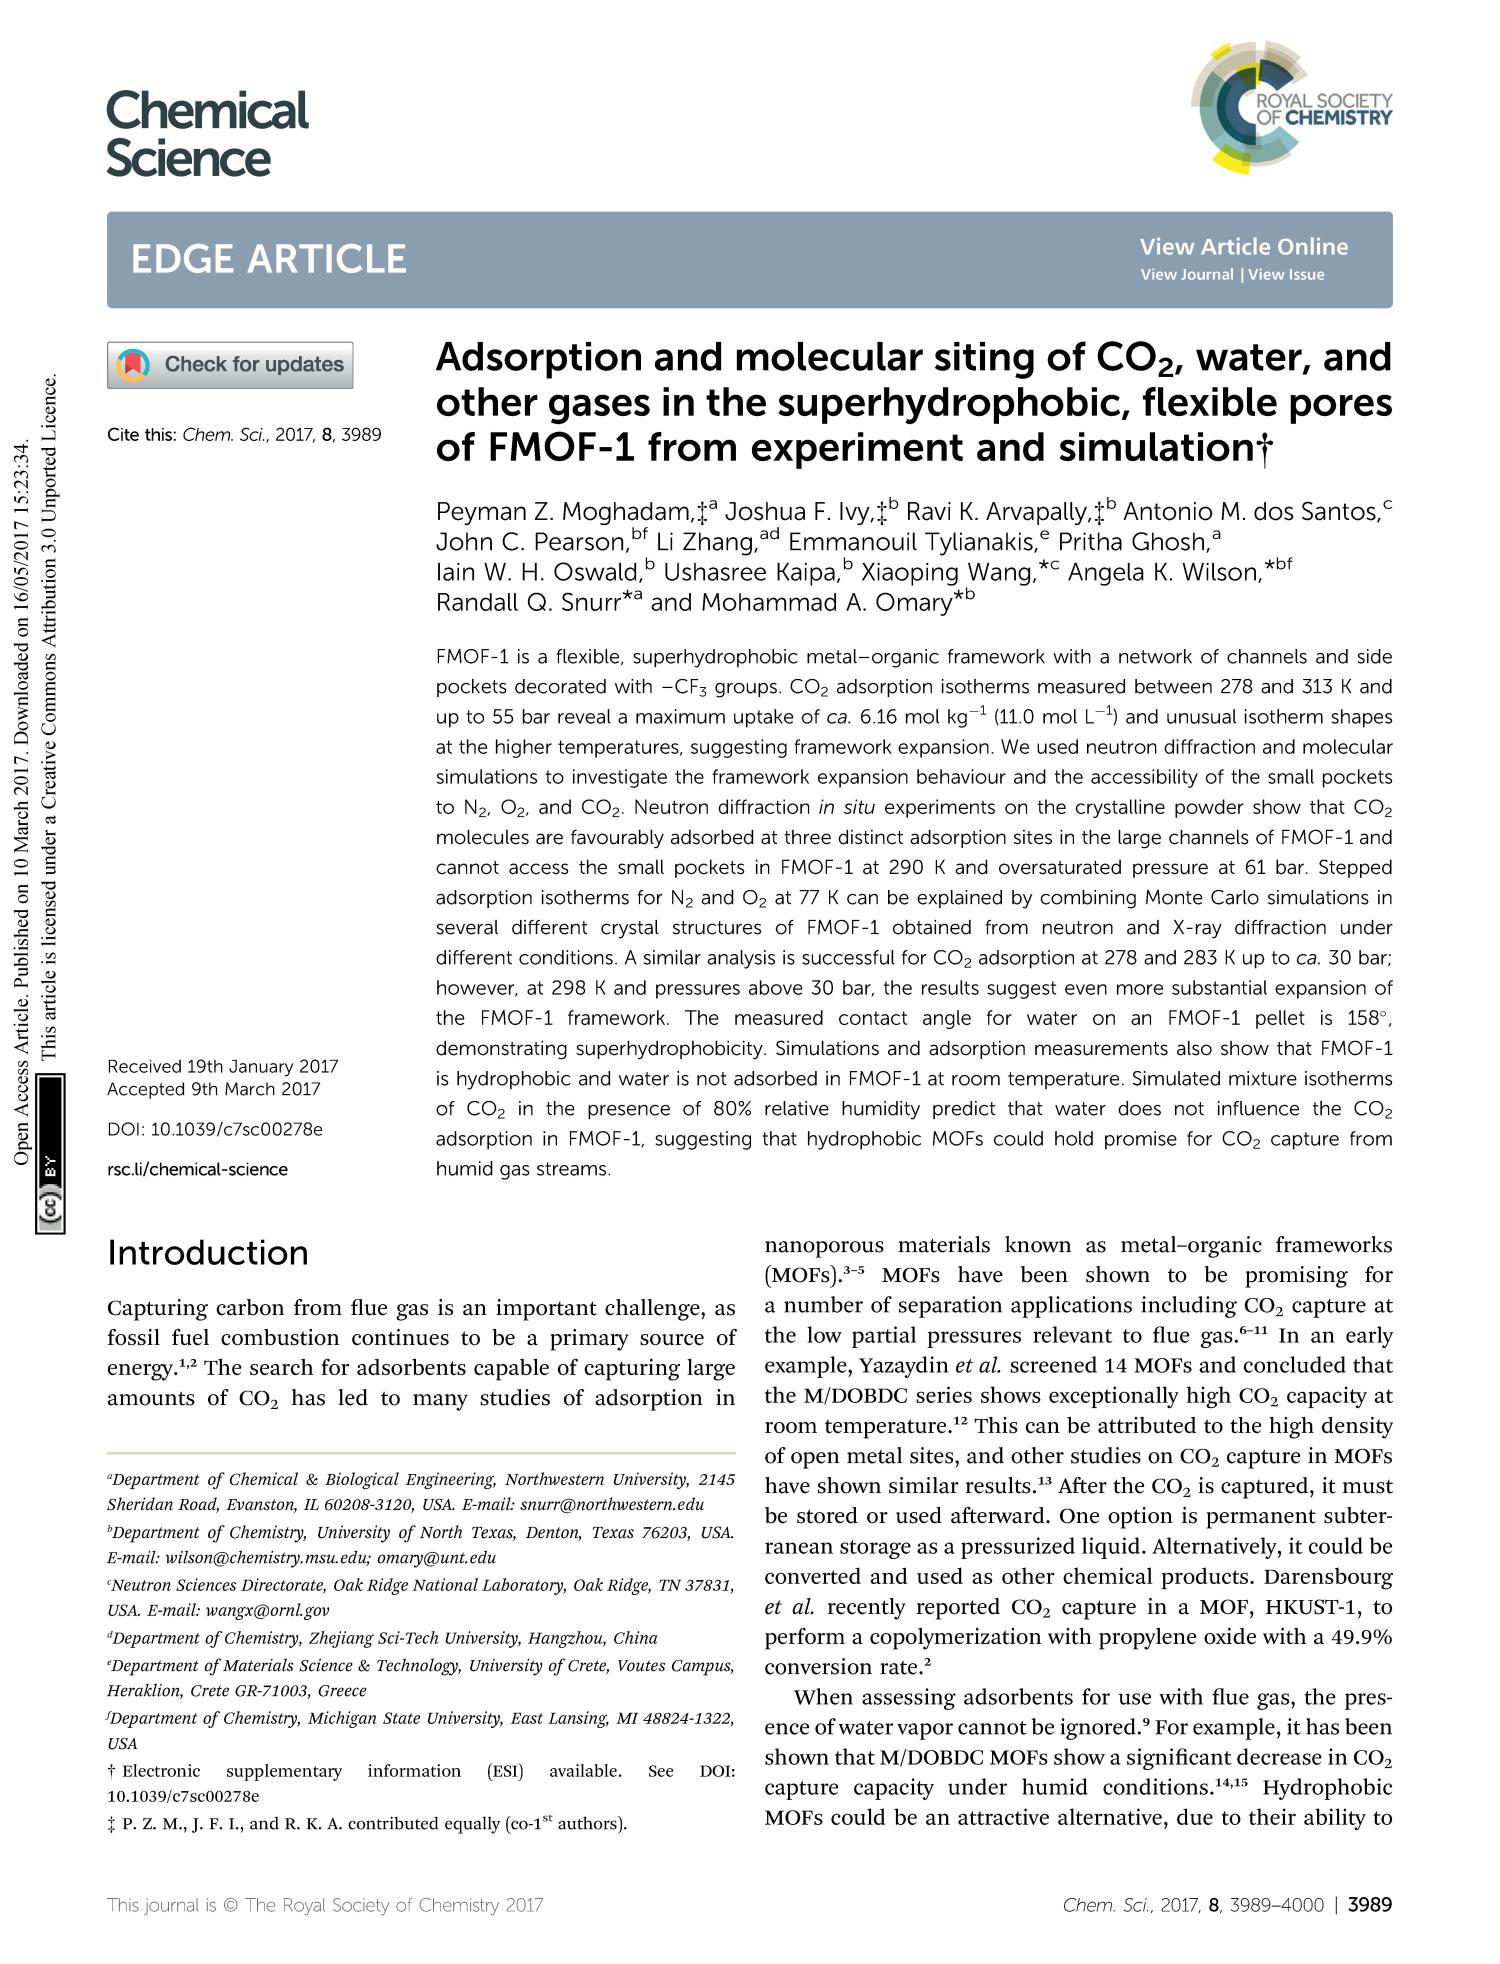 adsorption and molecular siting